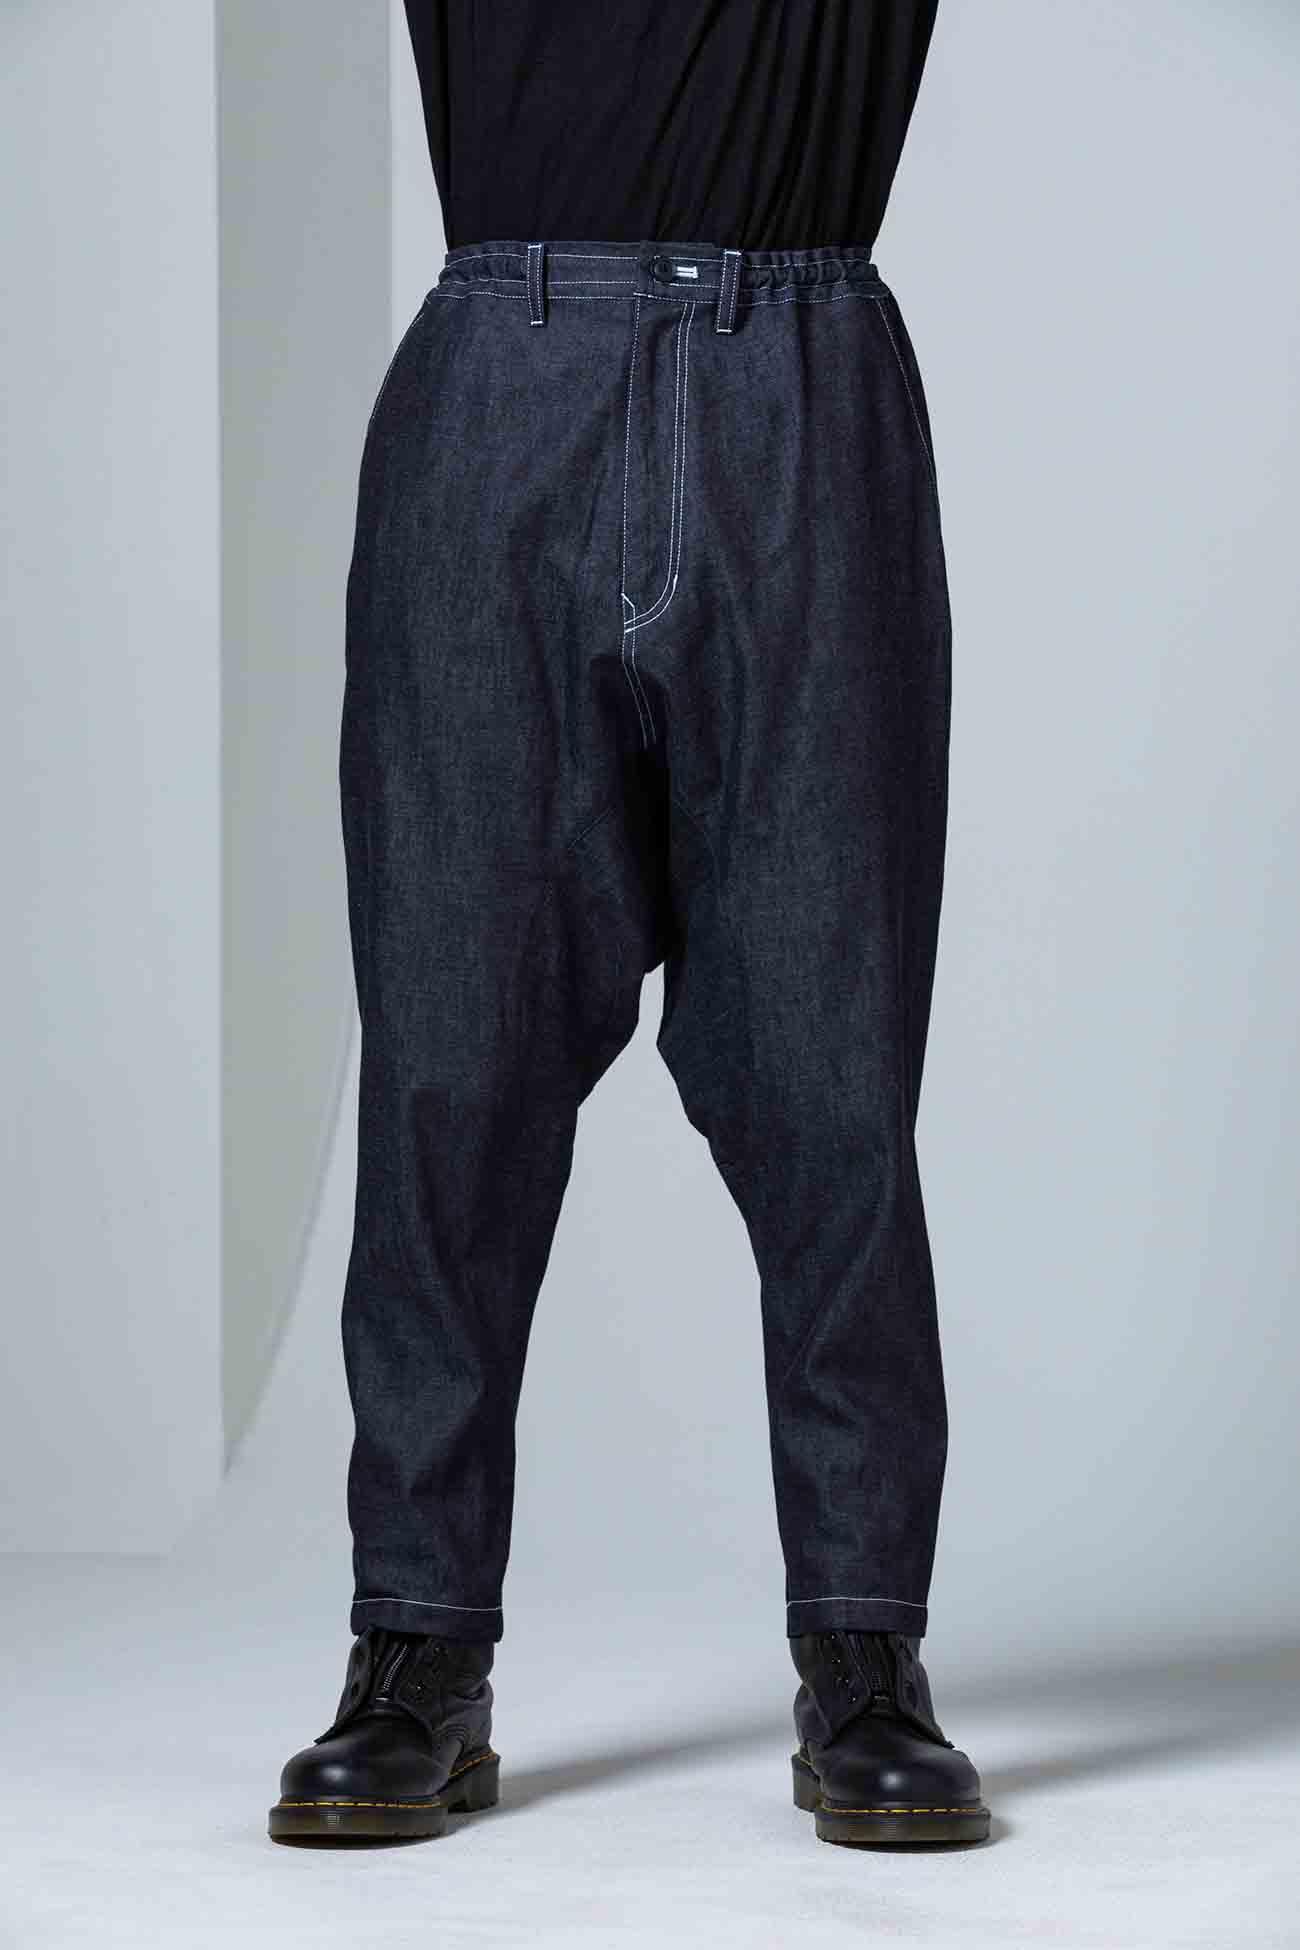 6oz Denim Deep Sarrouel Pants